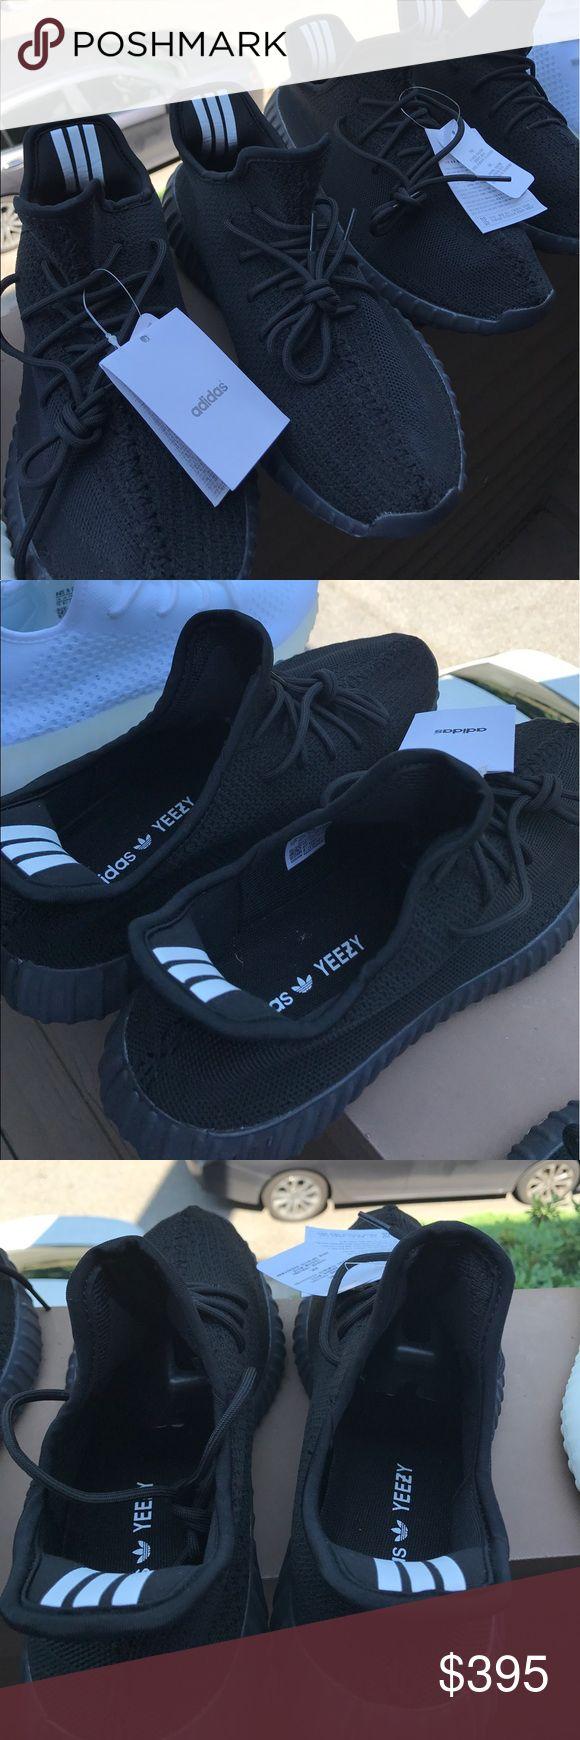 Yeezys 350 V2 Blacks Boost V2 350 All Blacks Yeezy Shoes Sneakers